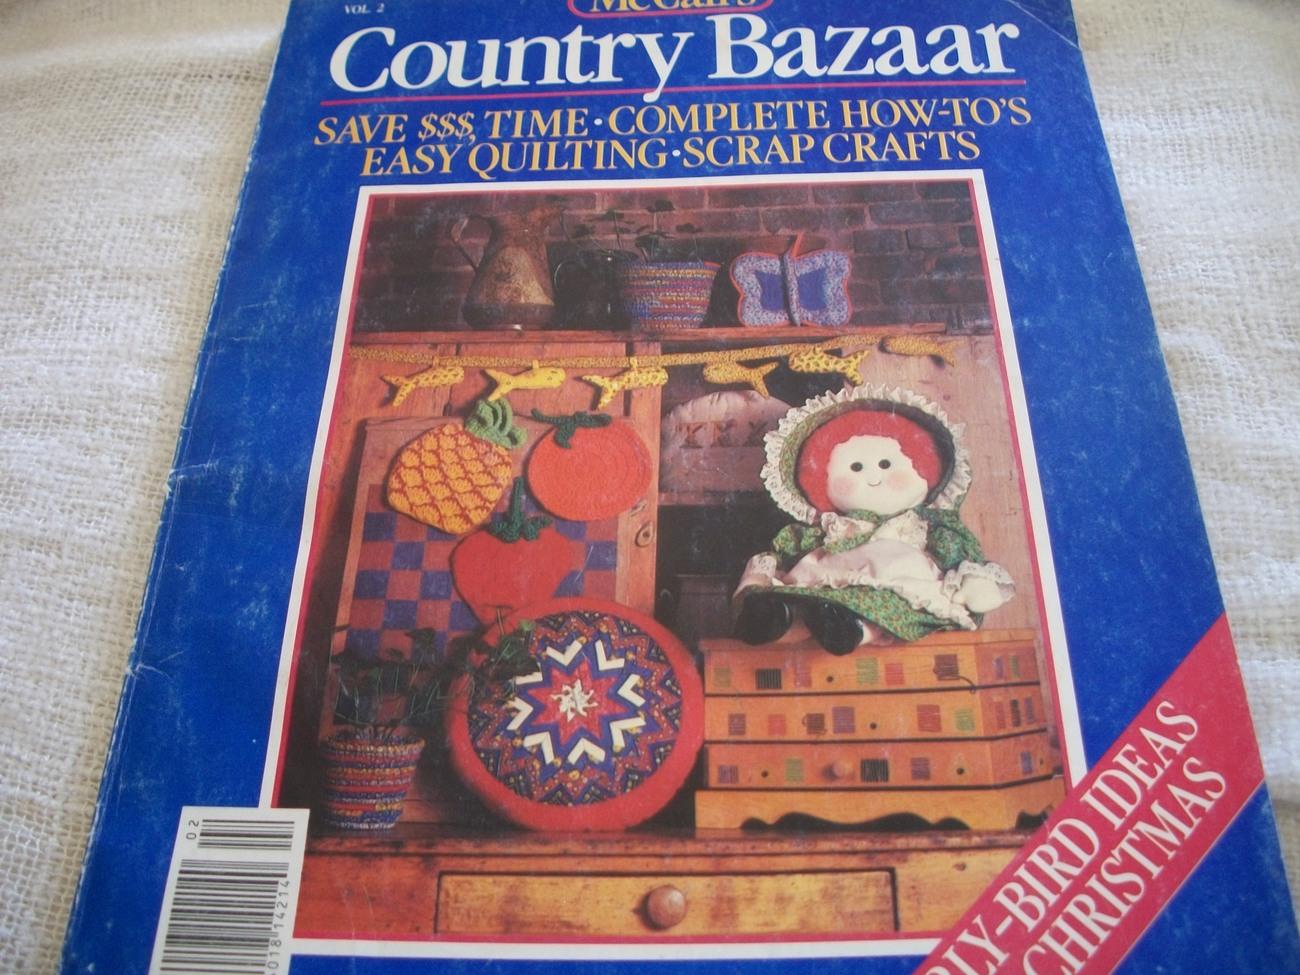 McCall's Country Bazaar Vol. 2 Magazine - $7.00